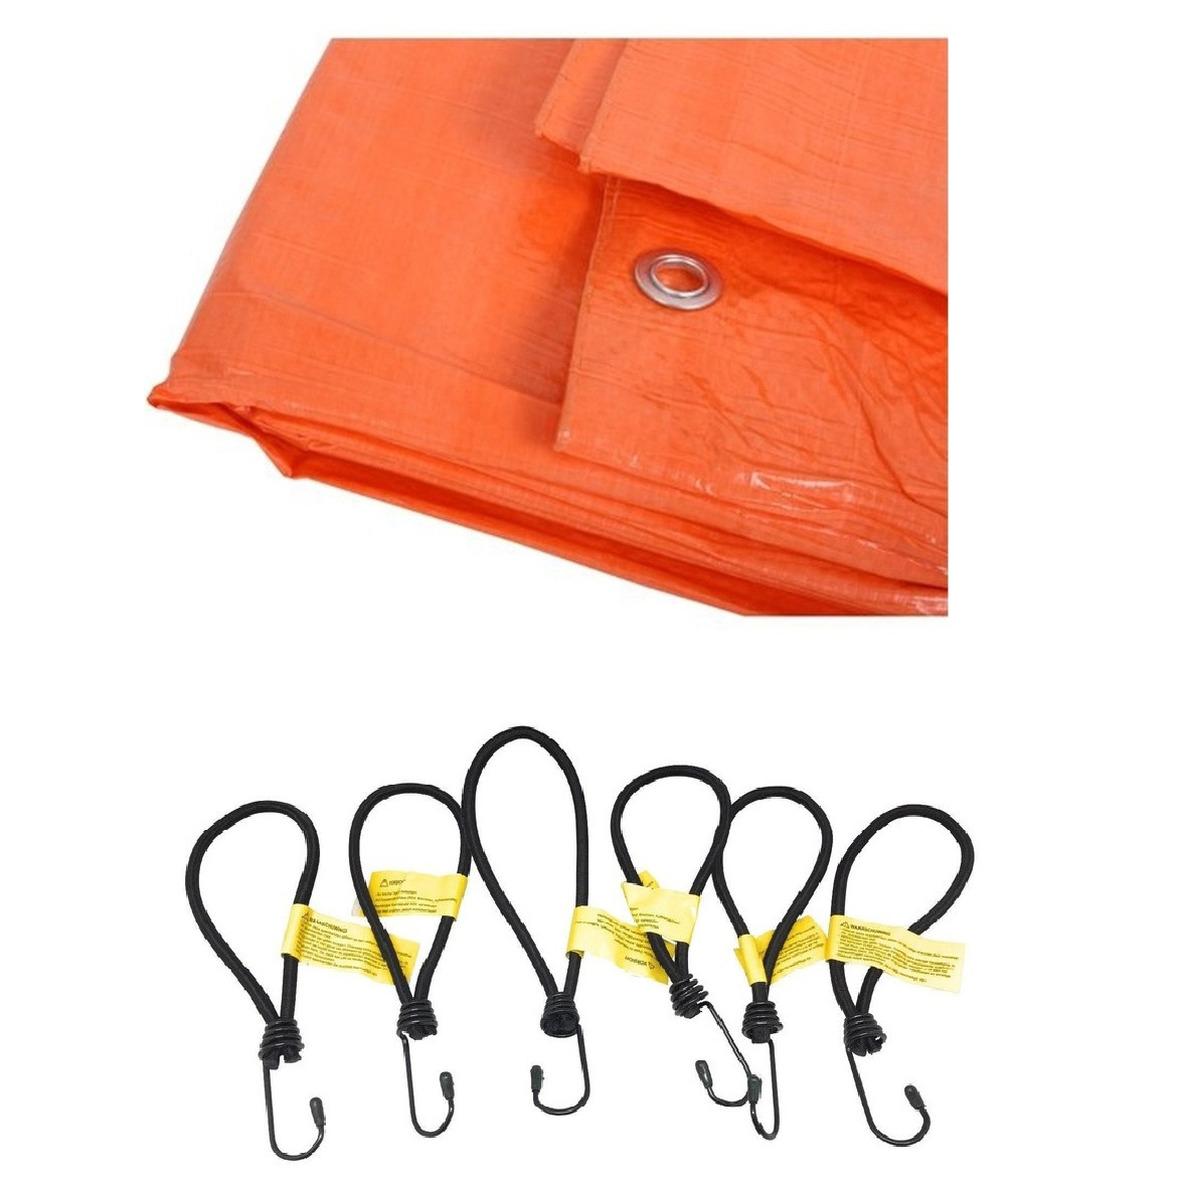 Oranje afdekzeil dekzeil 4 x 6 meter met 24x spanners haakjes